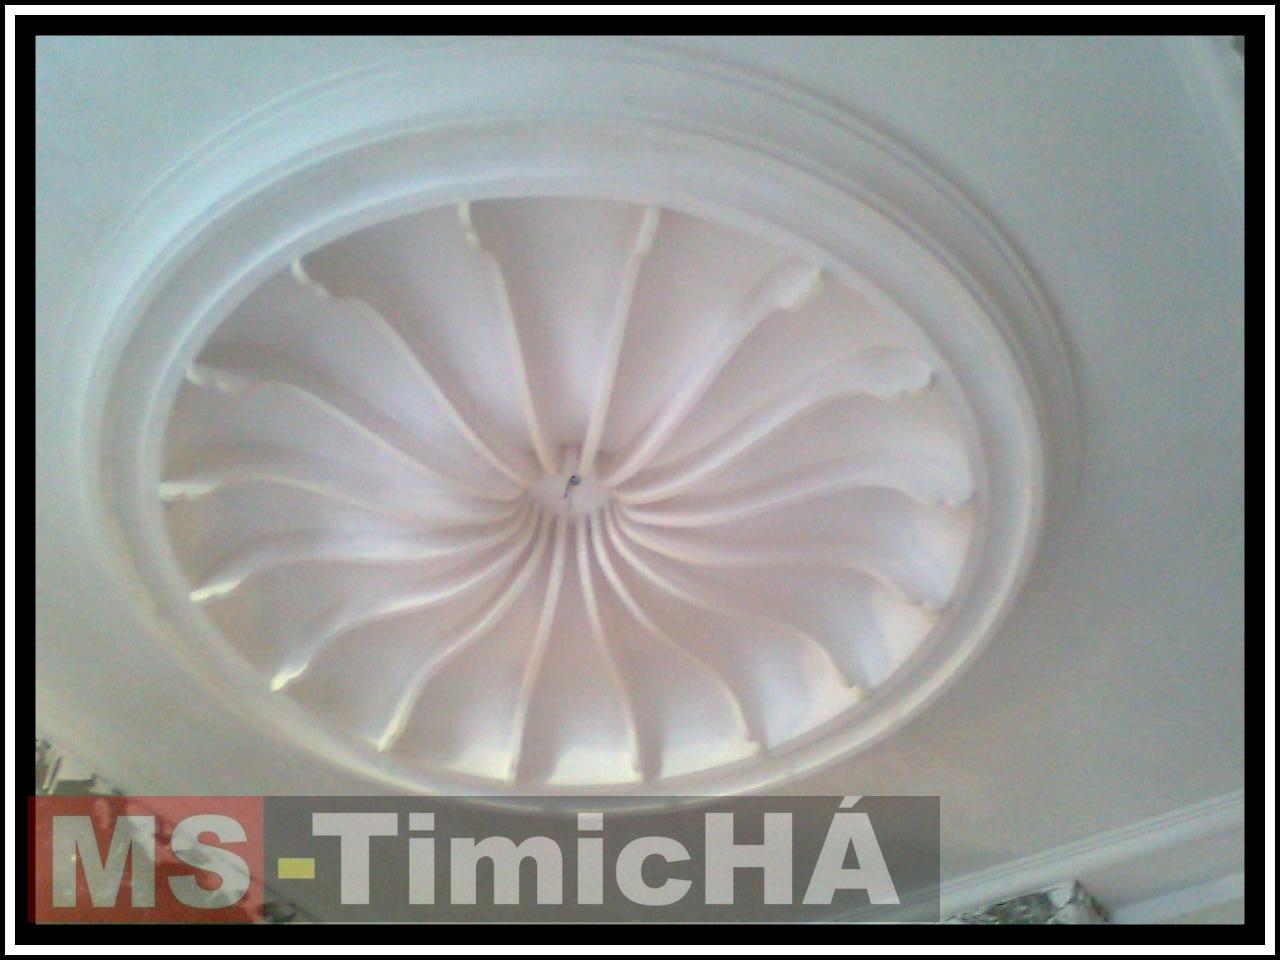 Platre marocain decoration platre - Decoration platre marocain 2012 ...